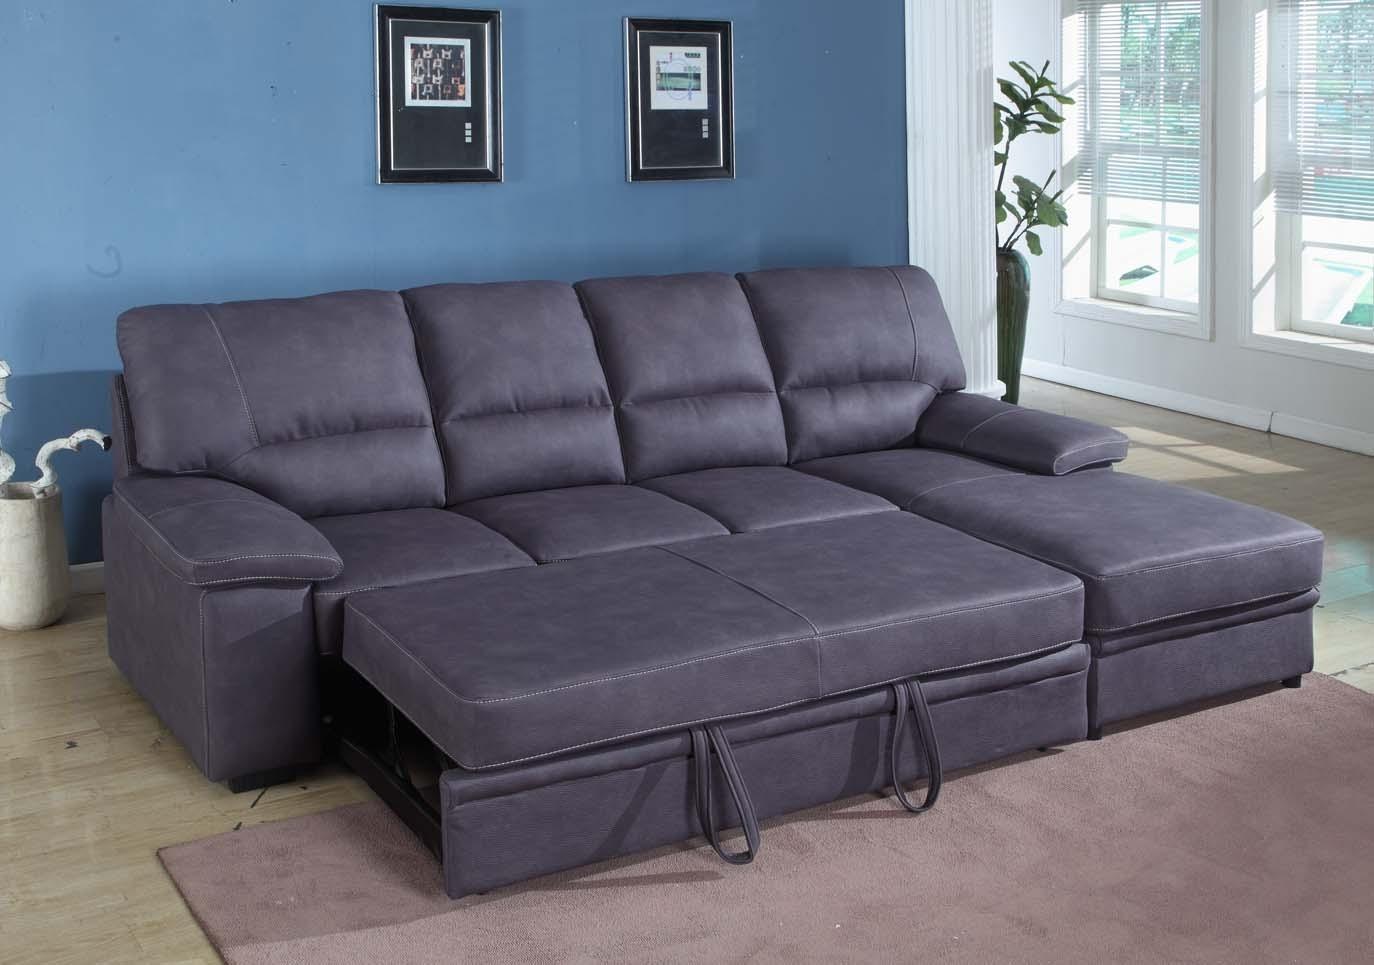 Grey Sleeper Sectional Sofa | Houston Mattress King With Sectional Sofas With Sleeper (View 8 of 10)